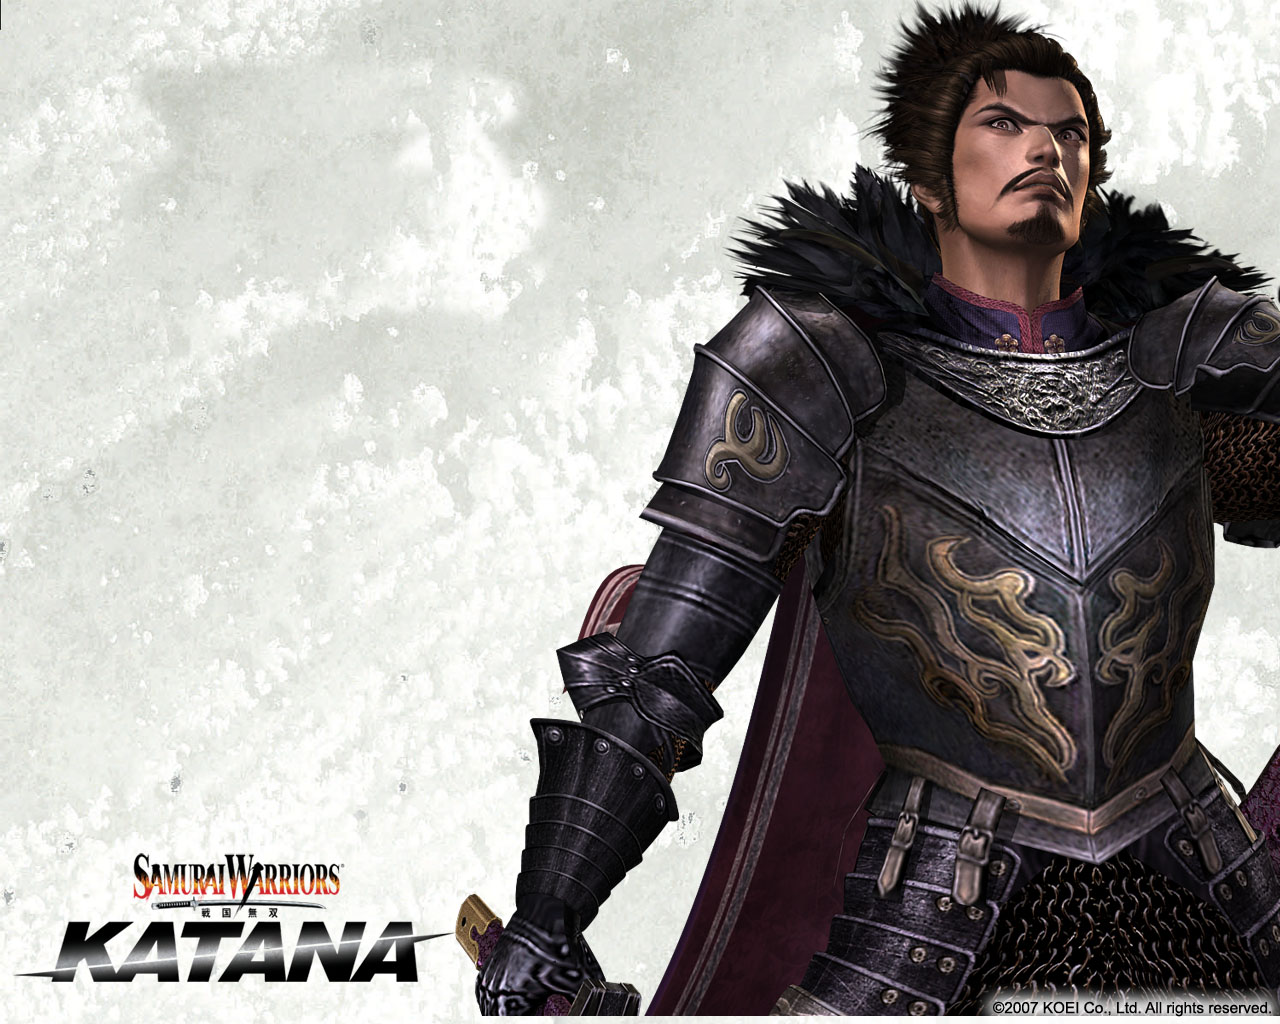 Samurai Warriors Katana 1280x1024